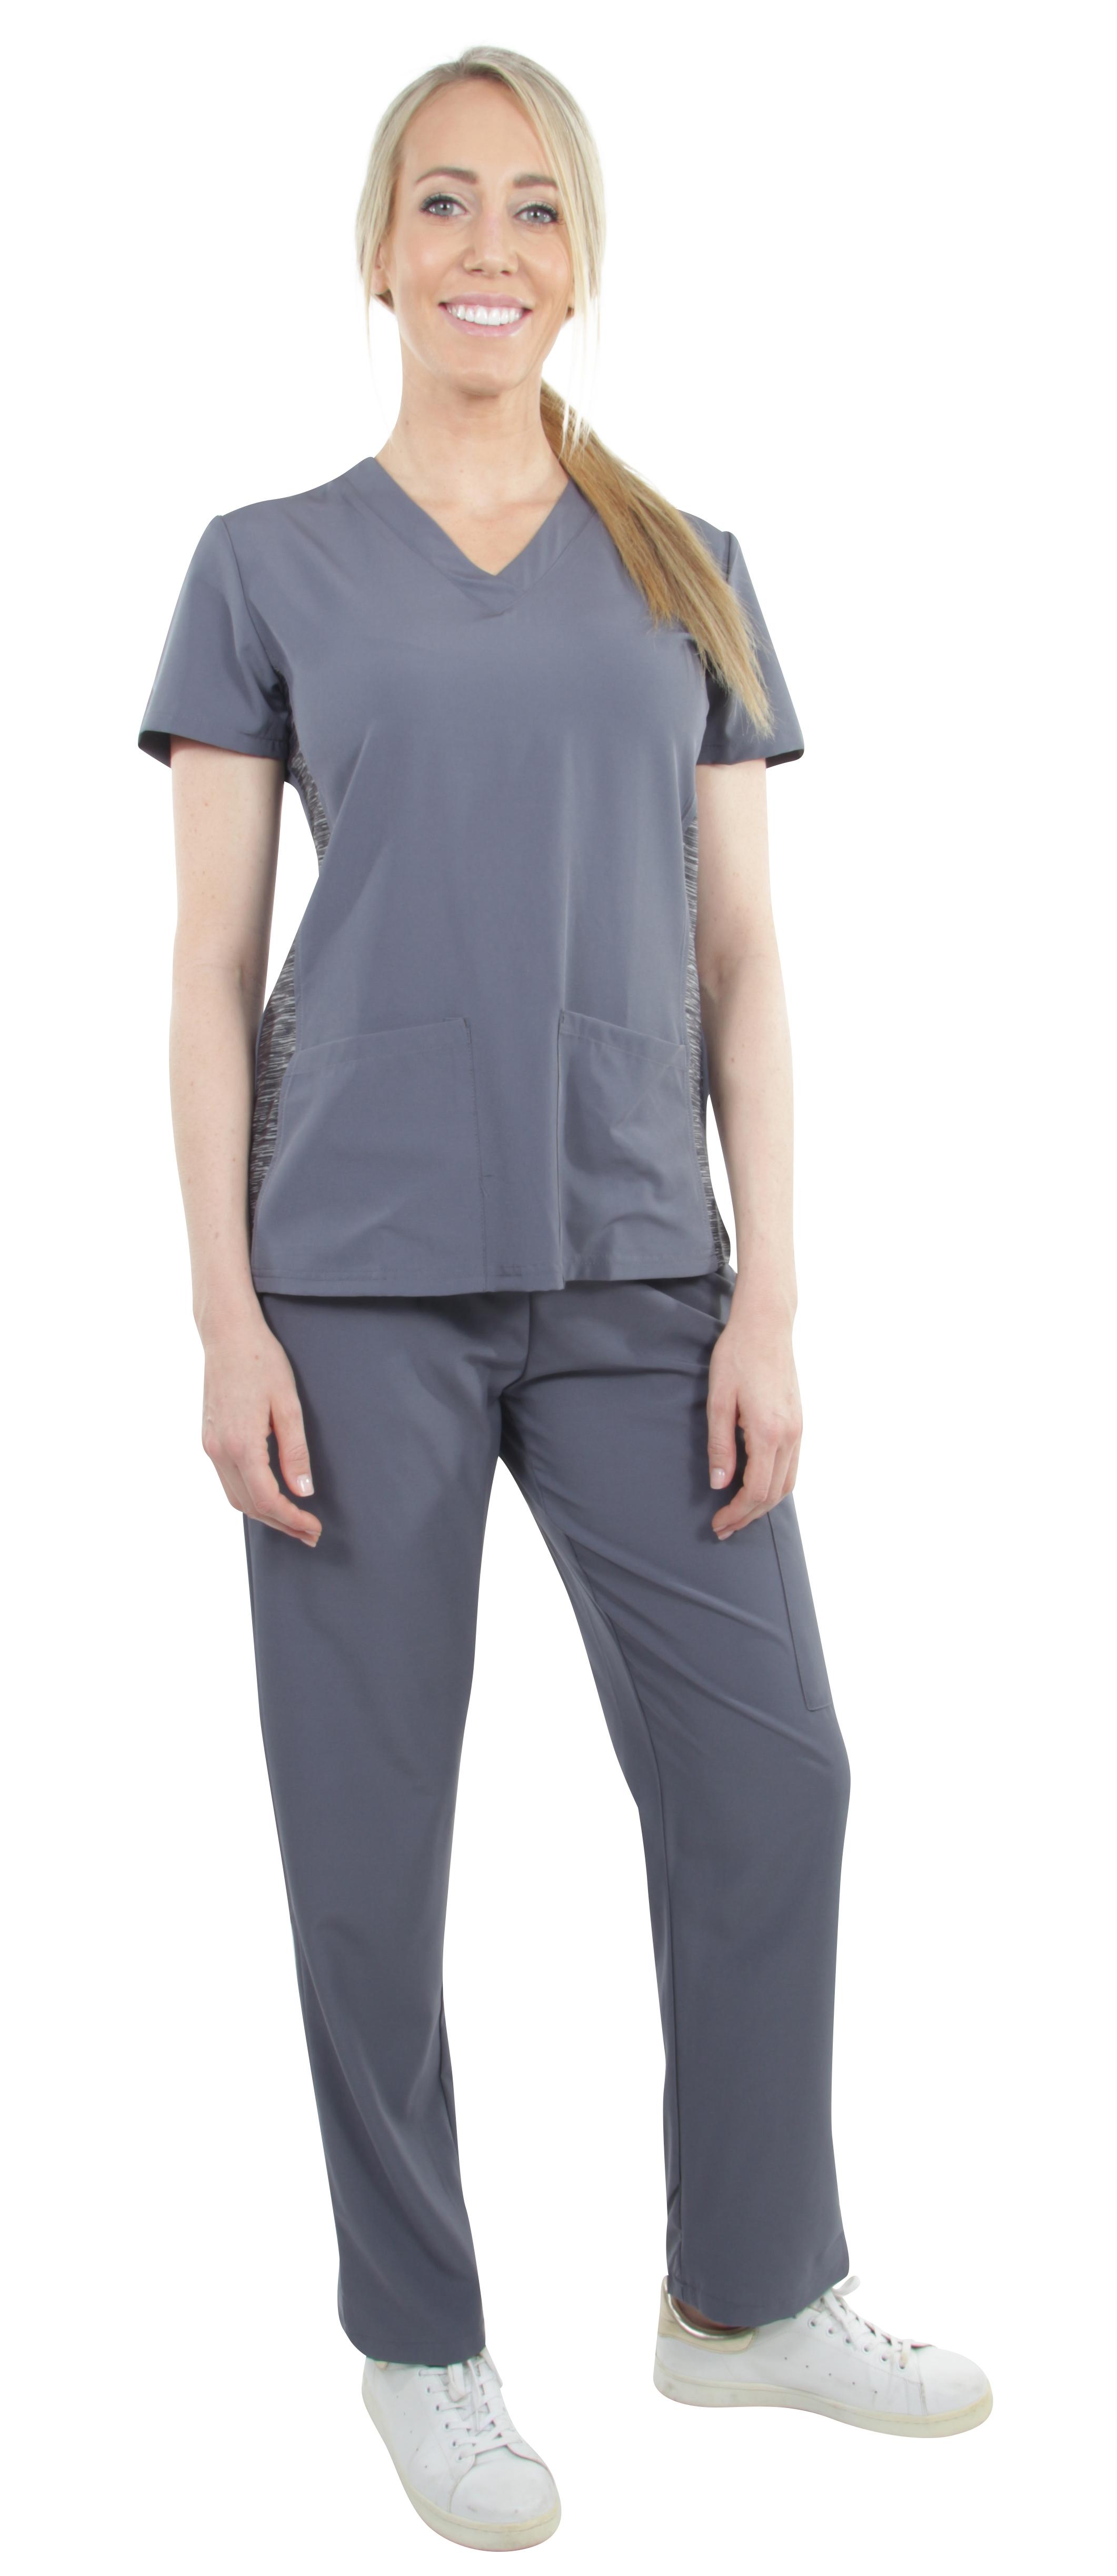 Unisex-Performance-Stretch-Medical-Uniform-Five-Pockets-V-Neck-Scrubs-Sets miniature 26